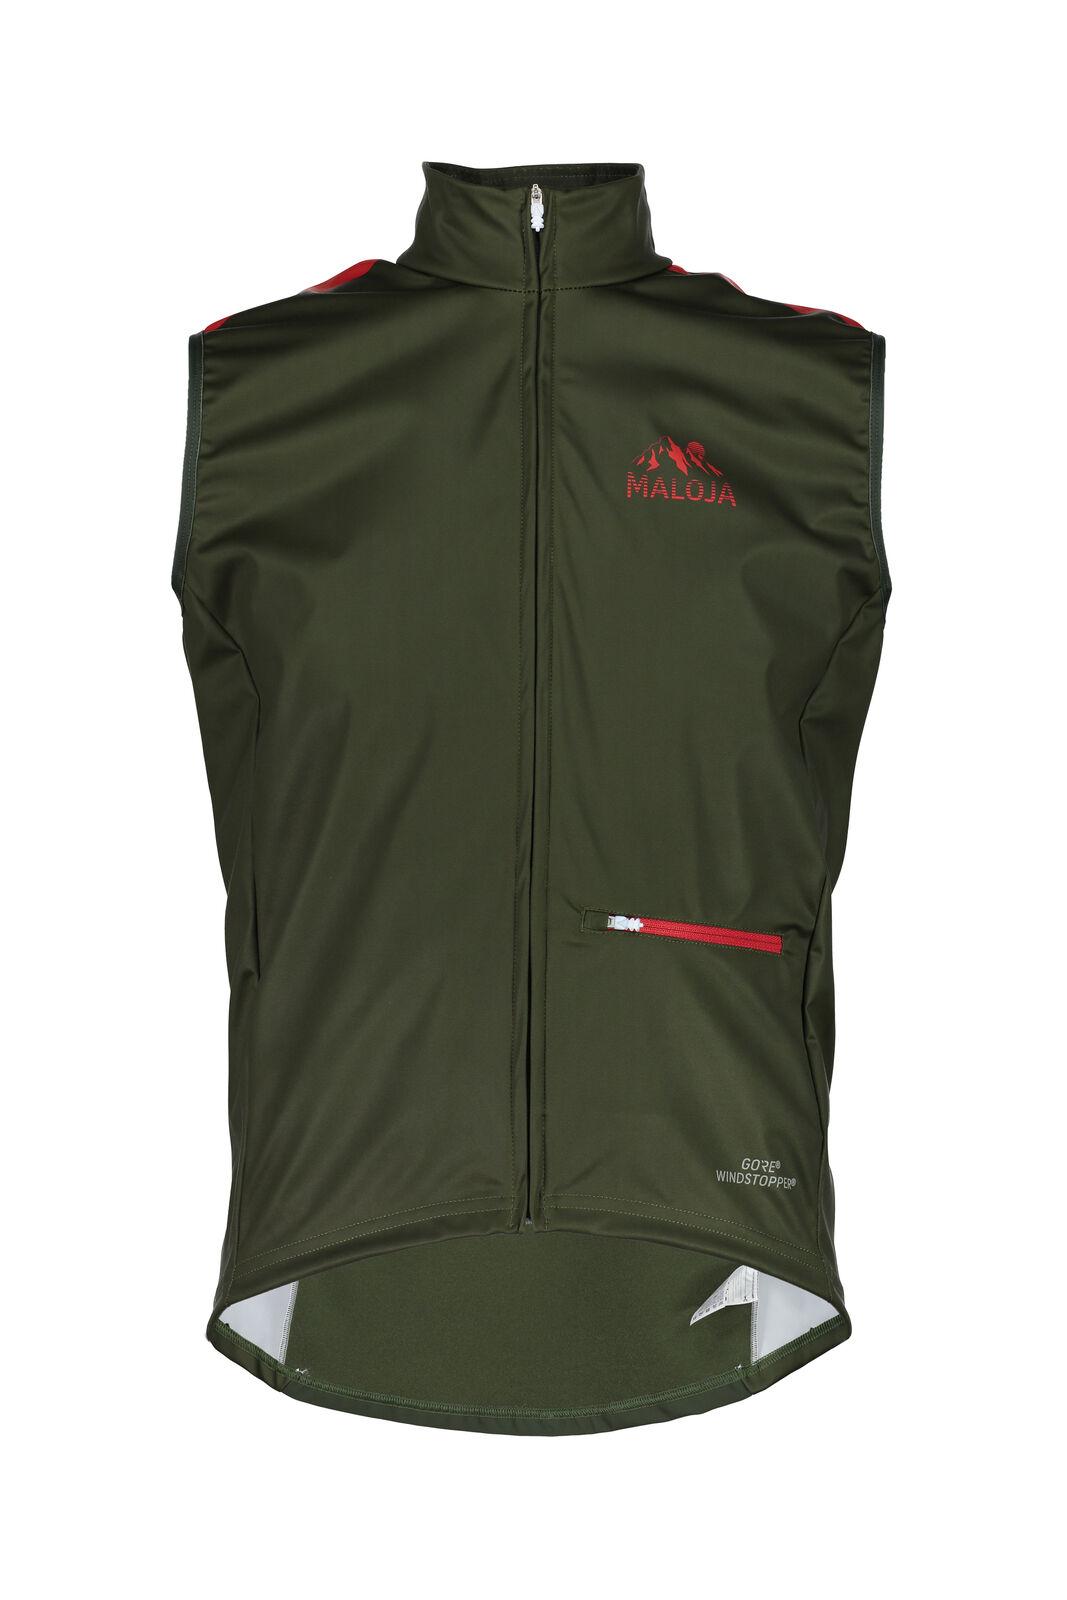 Maloja Cycling Vest Functional Vest Sports Vest Green Prestonm. Windproof